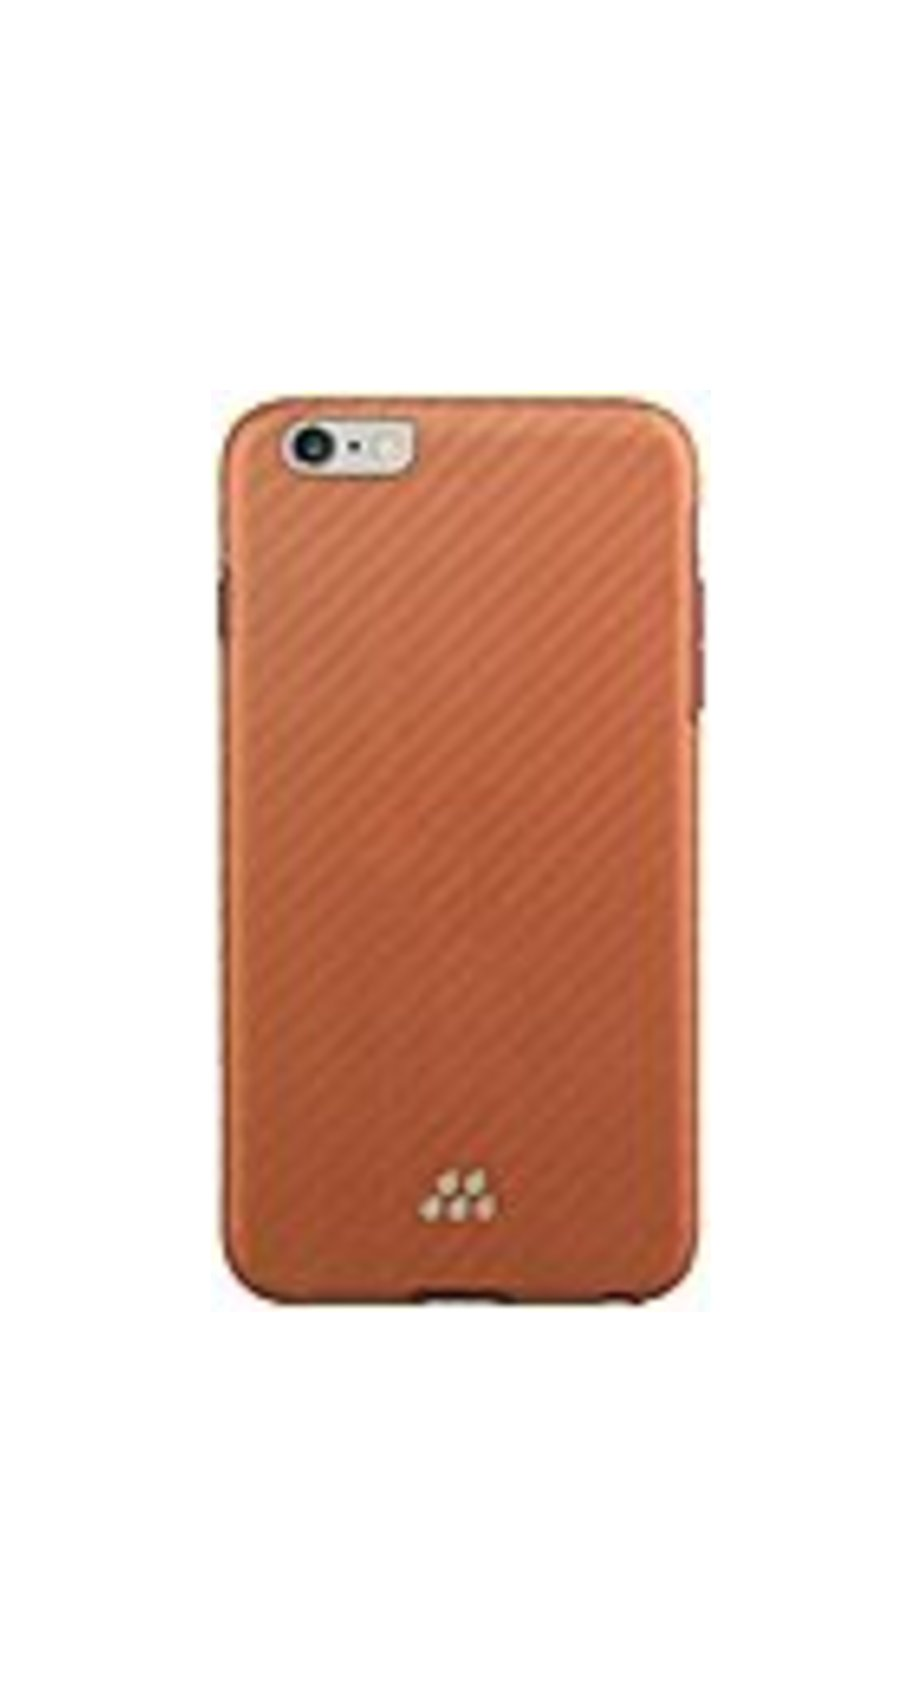 Evutec Karbon SI Kalantar for iPhone 6/6S Plus - iPhone 6 Plus, iPhone 6S Plus - Rose Gold - Smooth - Slip Resistant, Scratch Resistant, Shock Resista